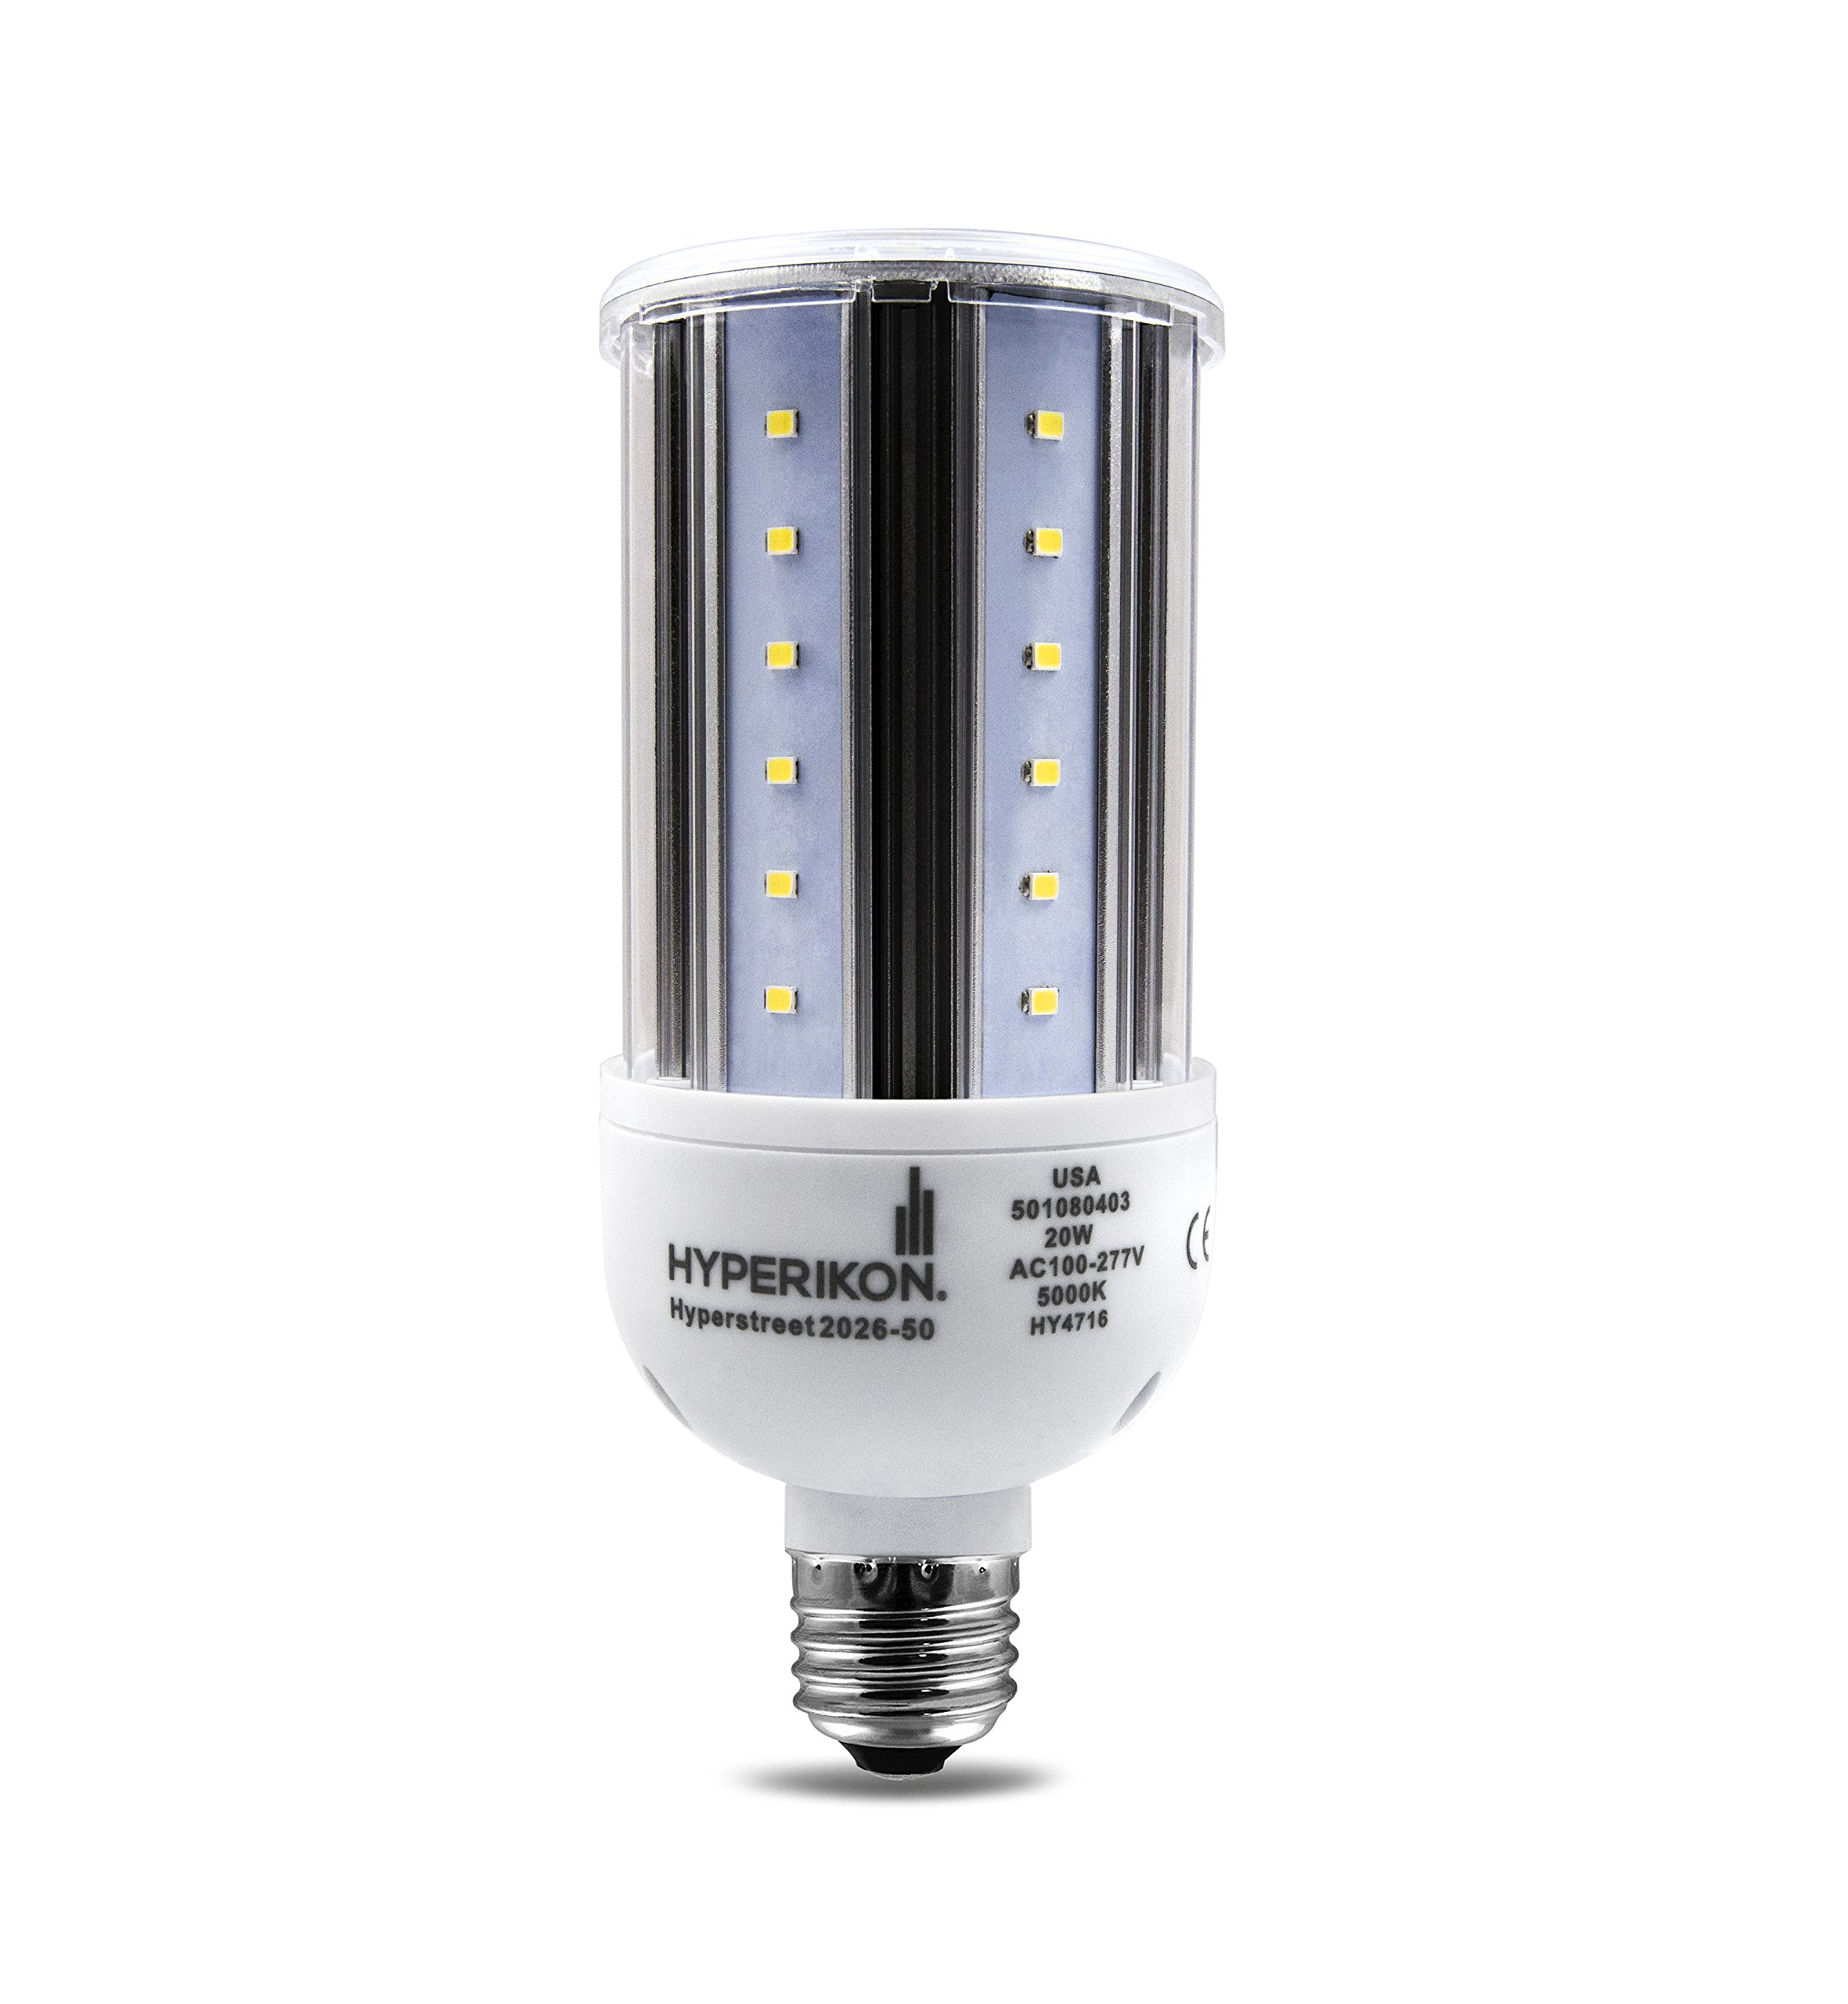 HyperSelect 20W LED Corn Light Bulb, Street and Area Light, E26 Medium Screw Base, 150 Watt Equivalent, Metal Halide Replacement, 2600 lumen, 5000K (Crystal White Glow), 360° Light, UL Listed